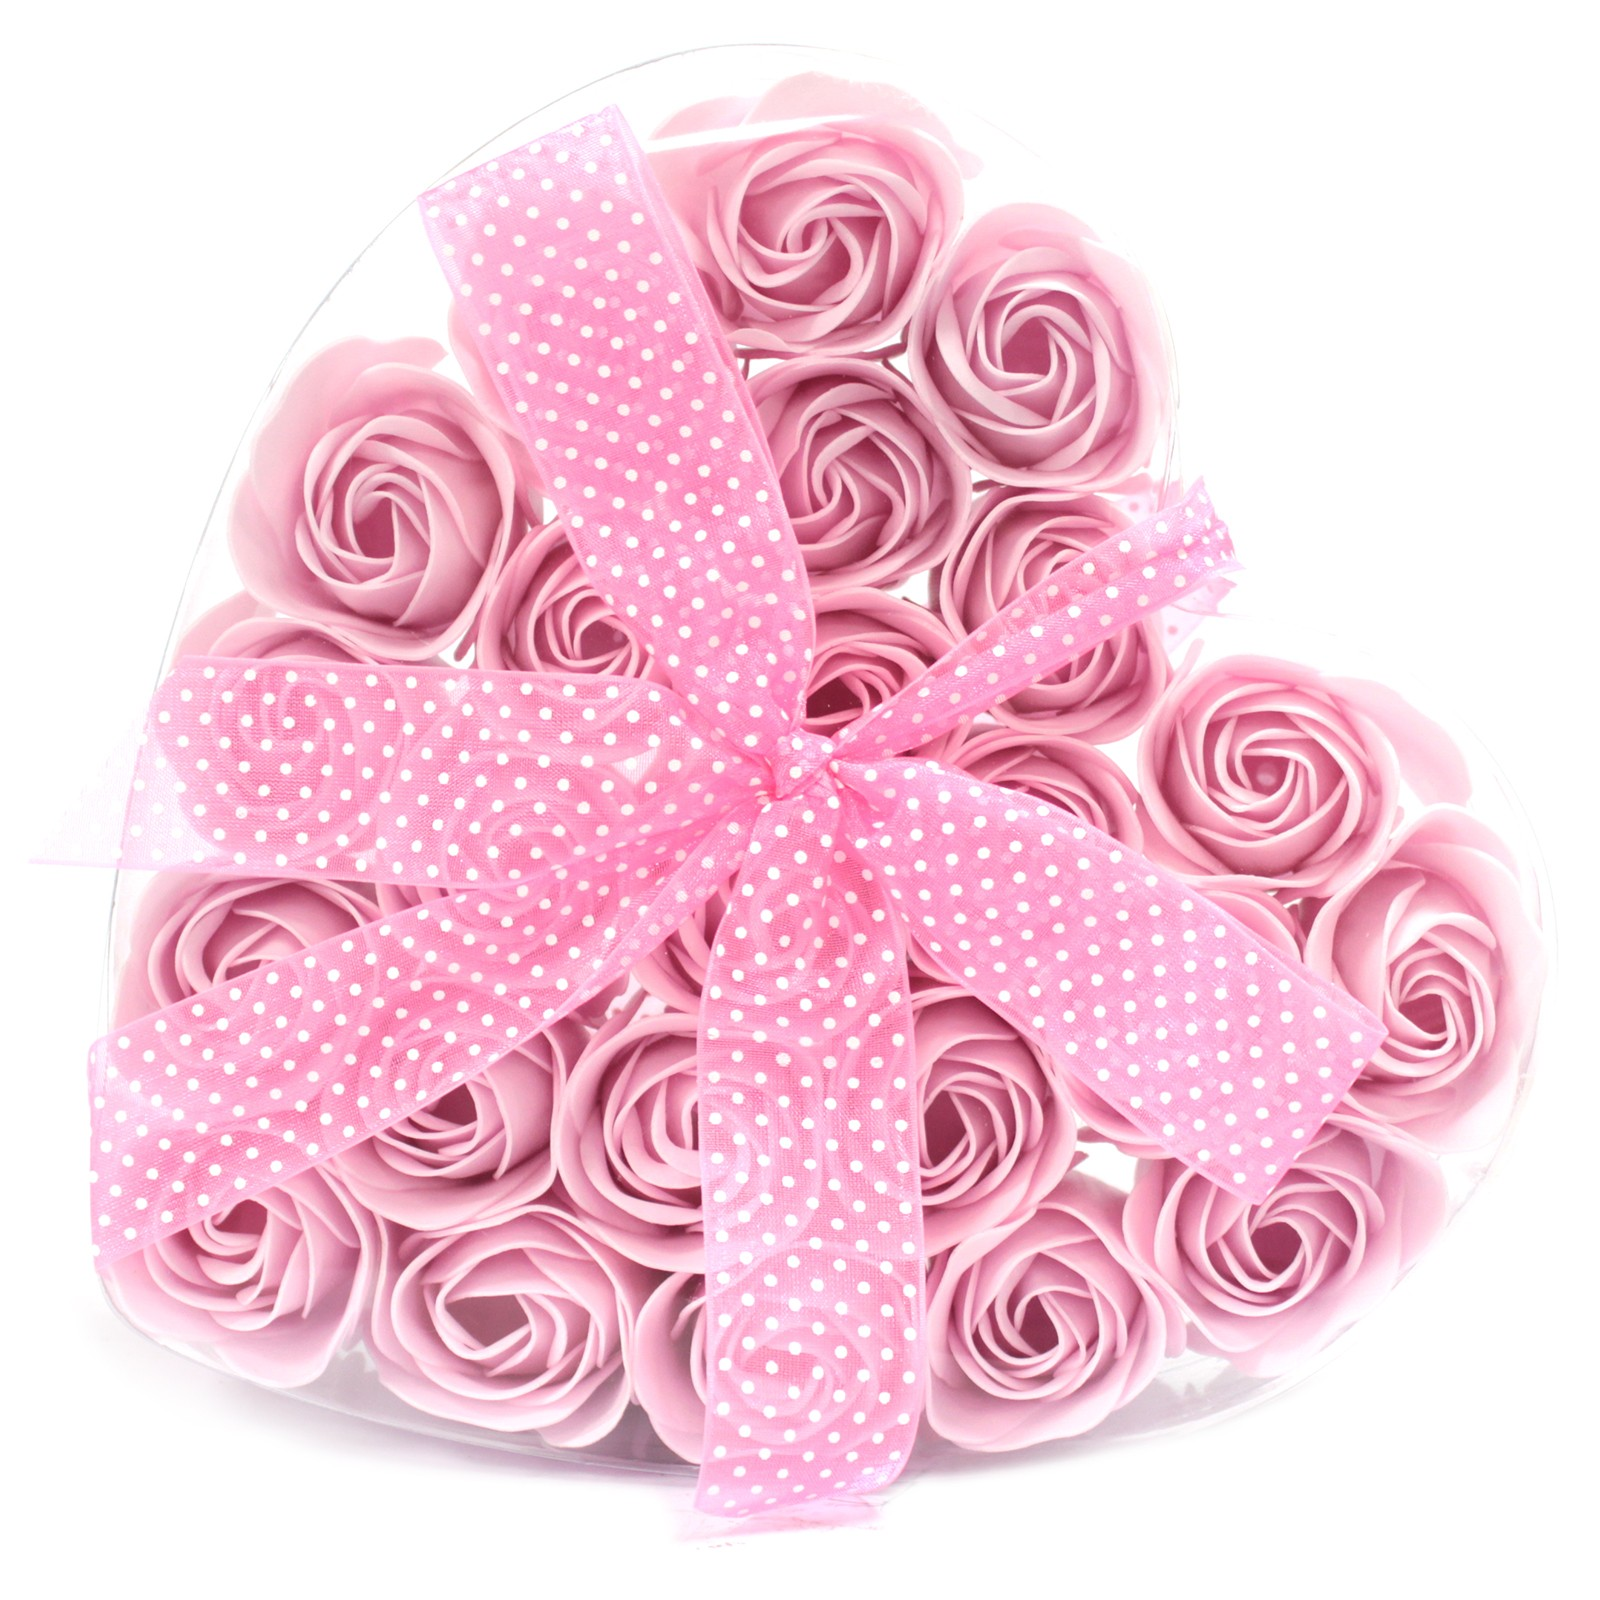 Set of 24 Soap Flower Heart Box Pink Roses